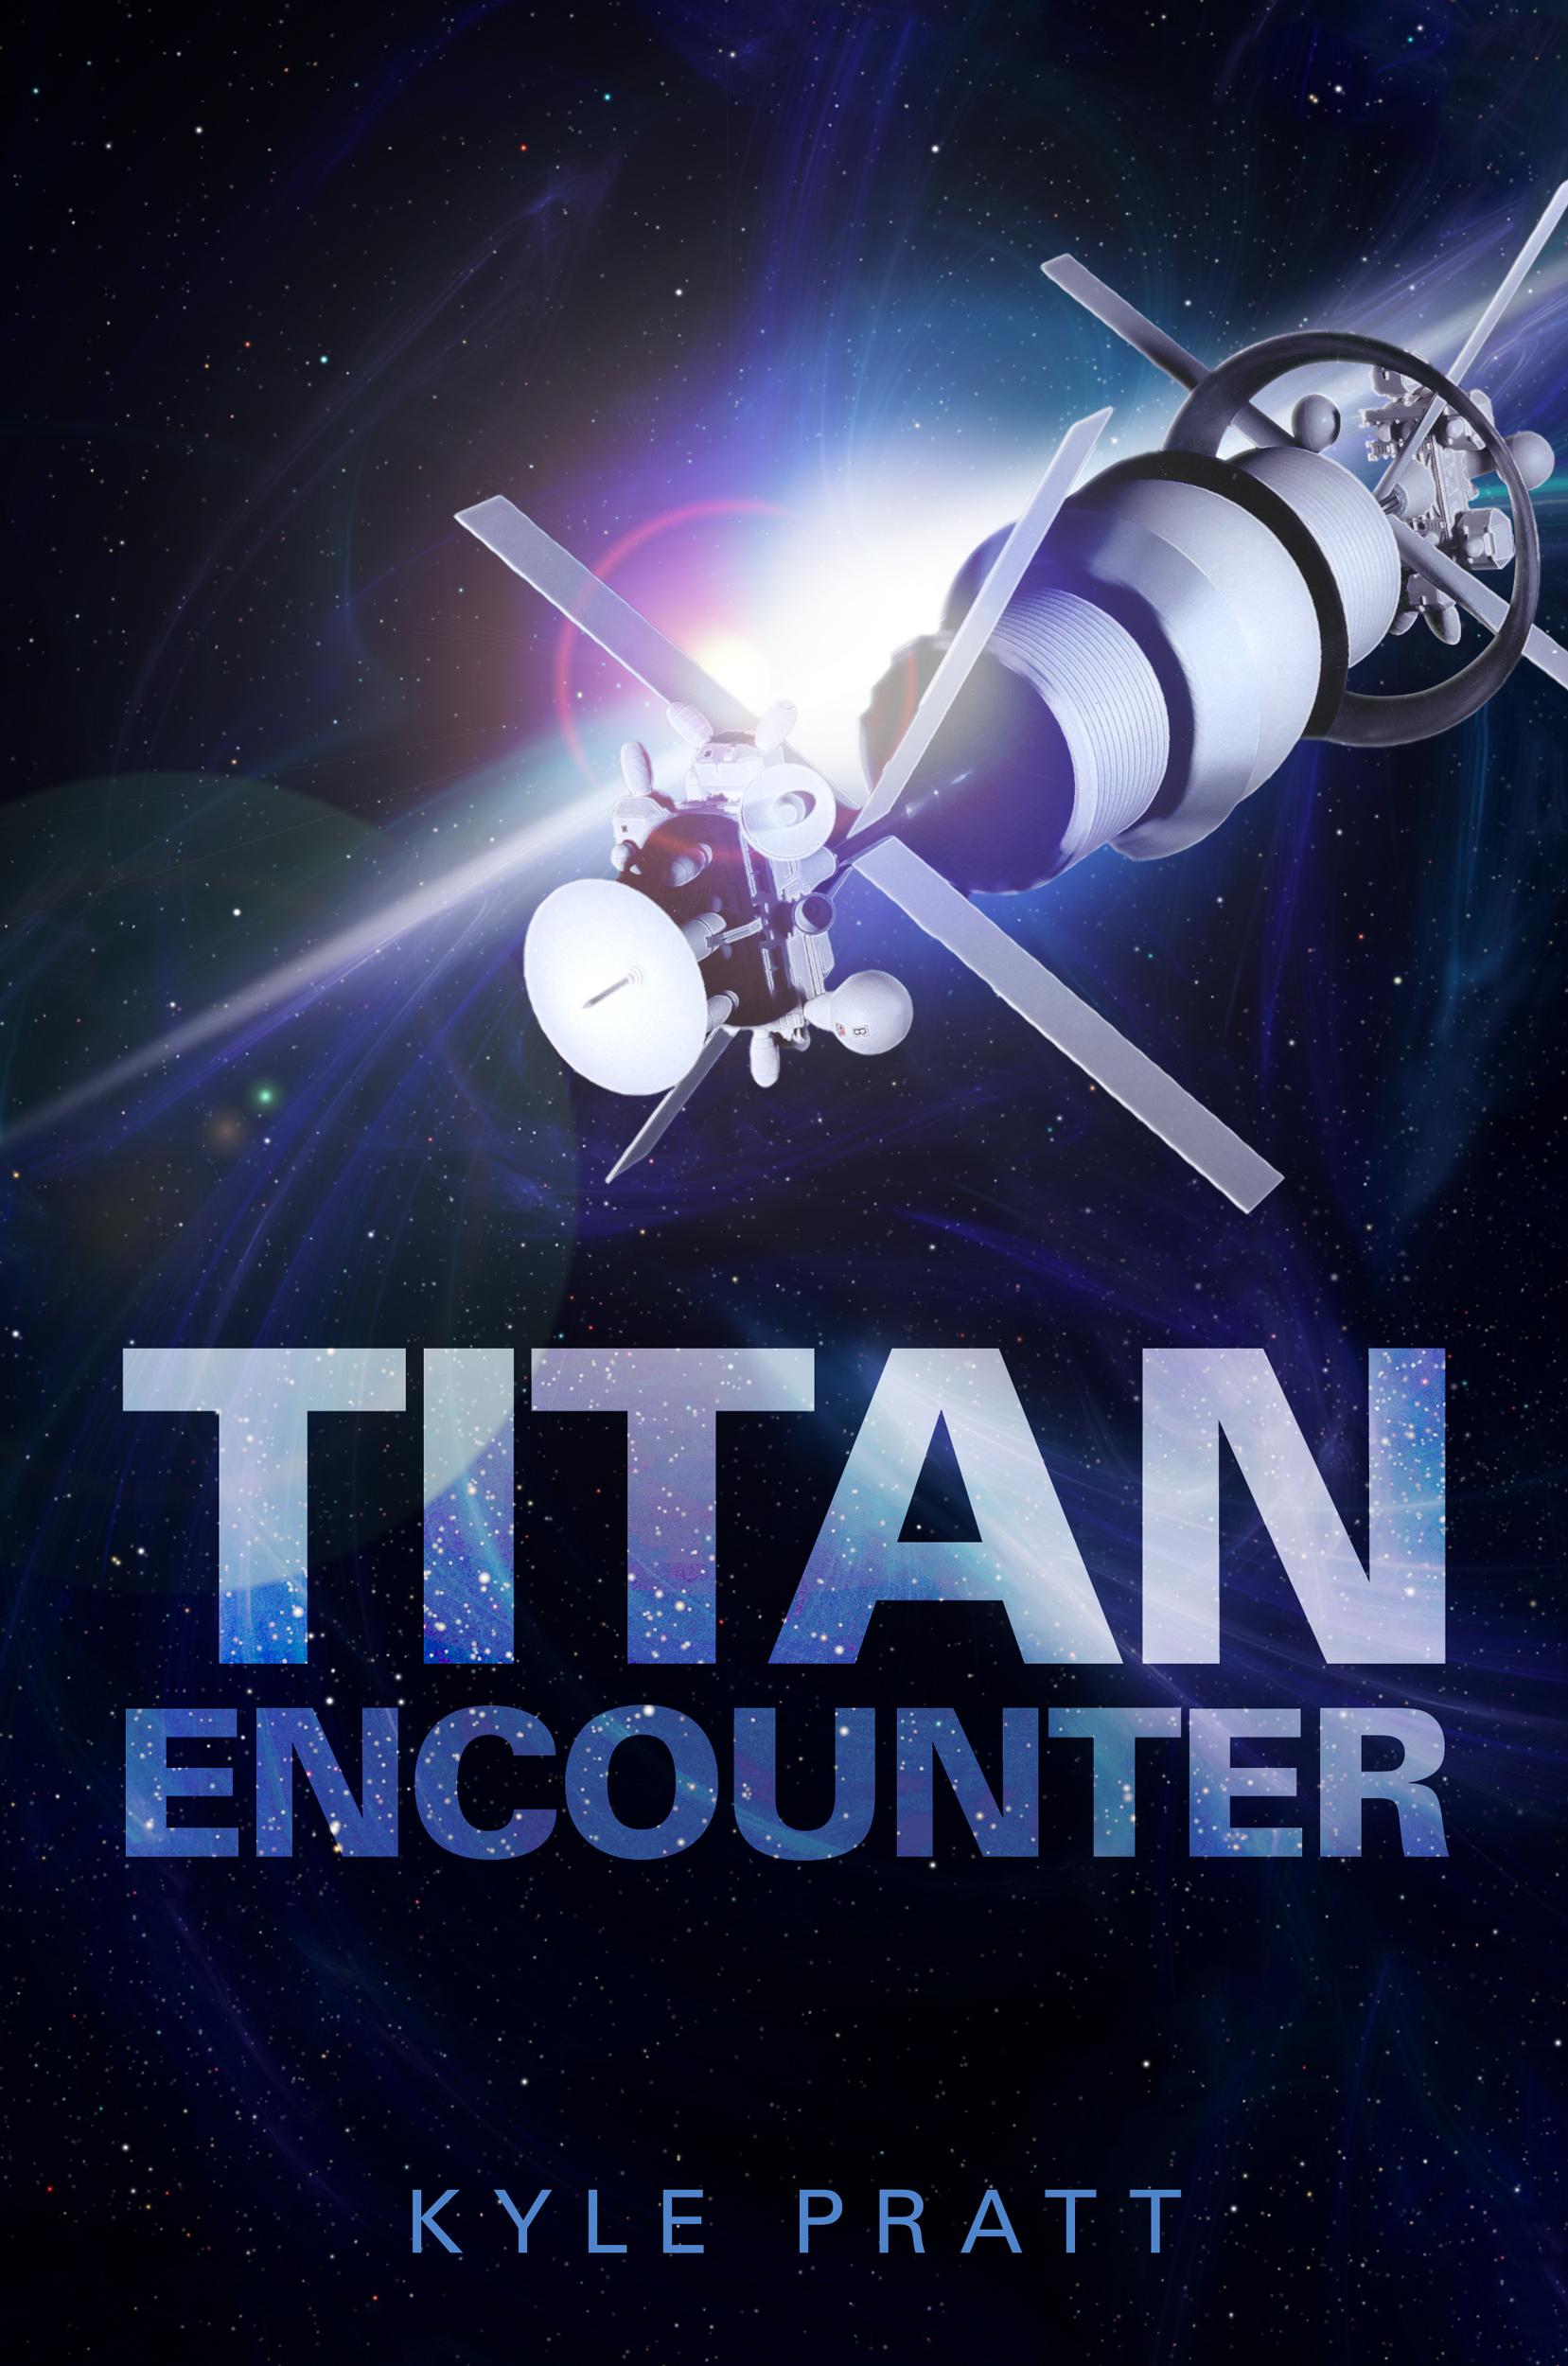 Titan_Encounter_cover_2500px.jpg